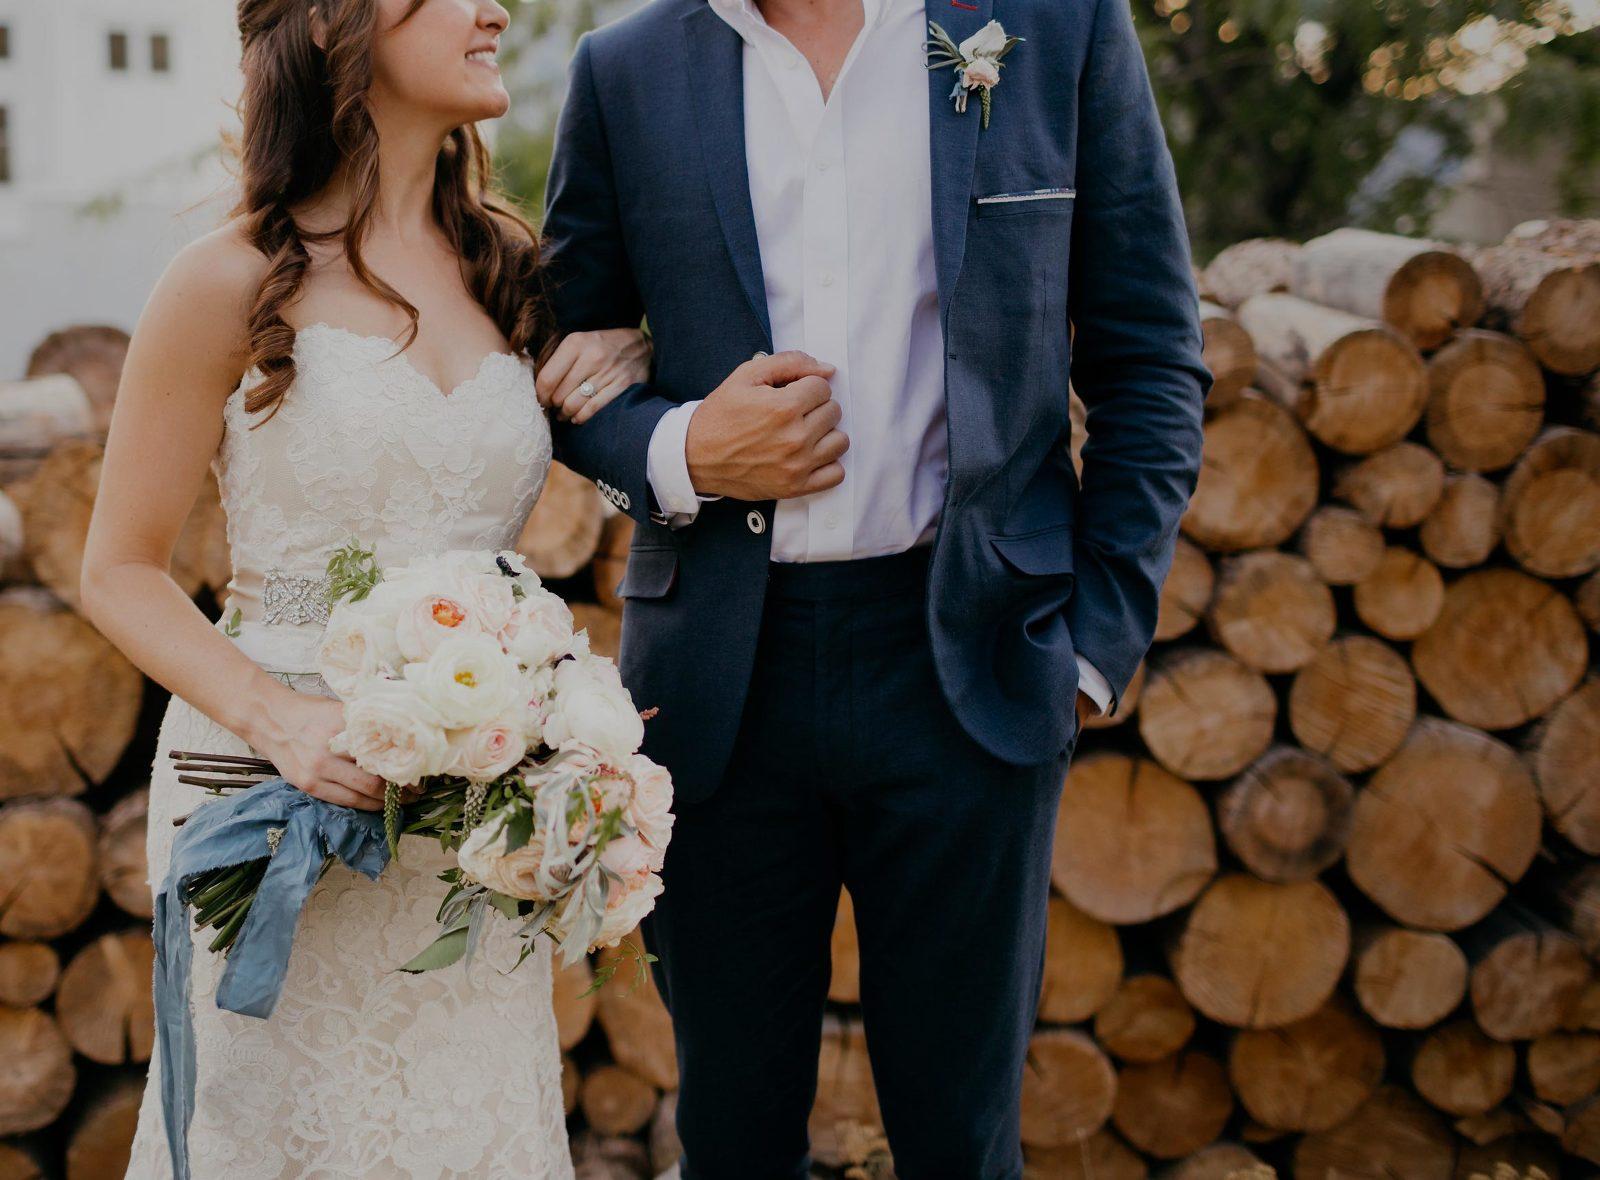 Snapmotive Photography - Adventure, Travel, Weddings, Engagements, Family